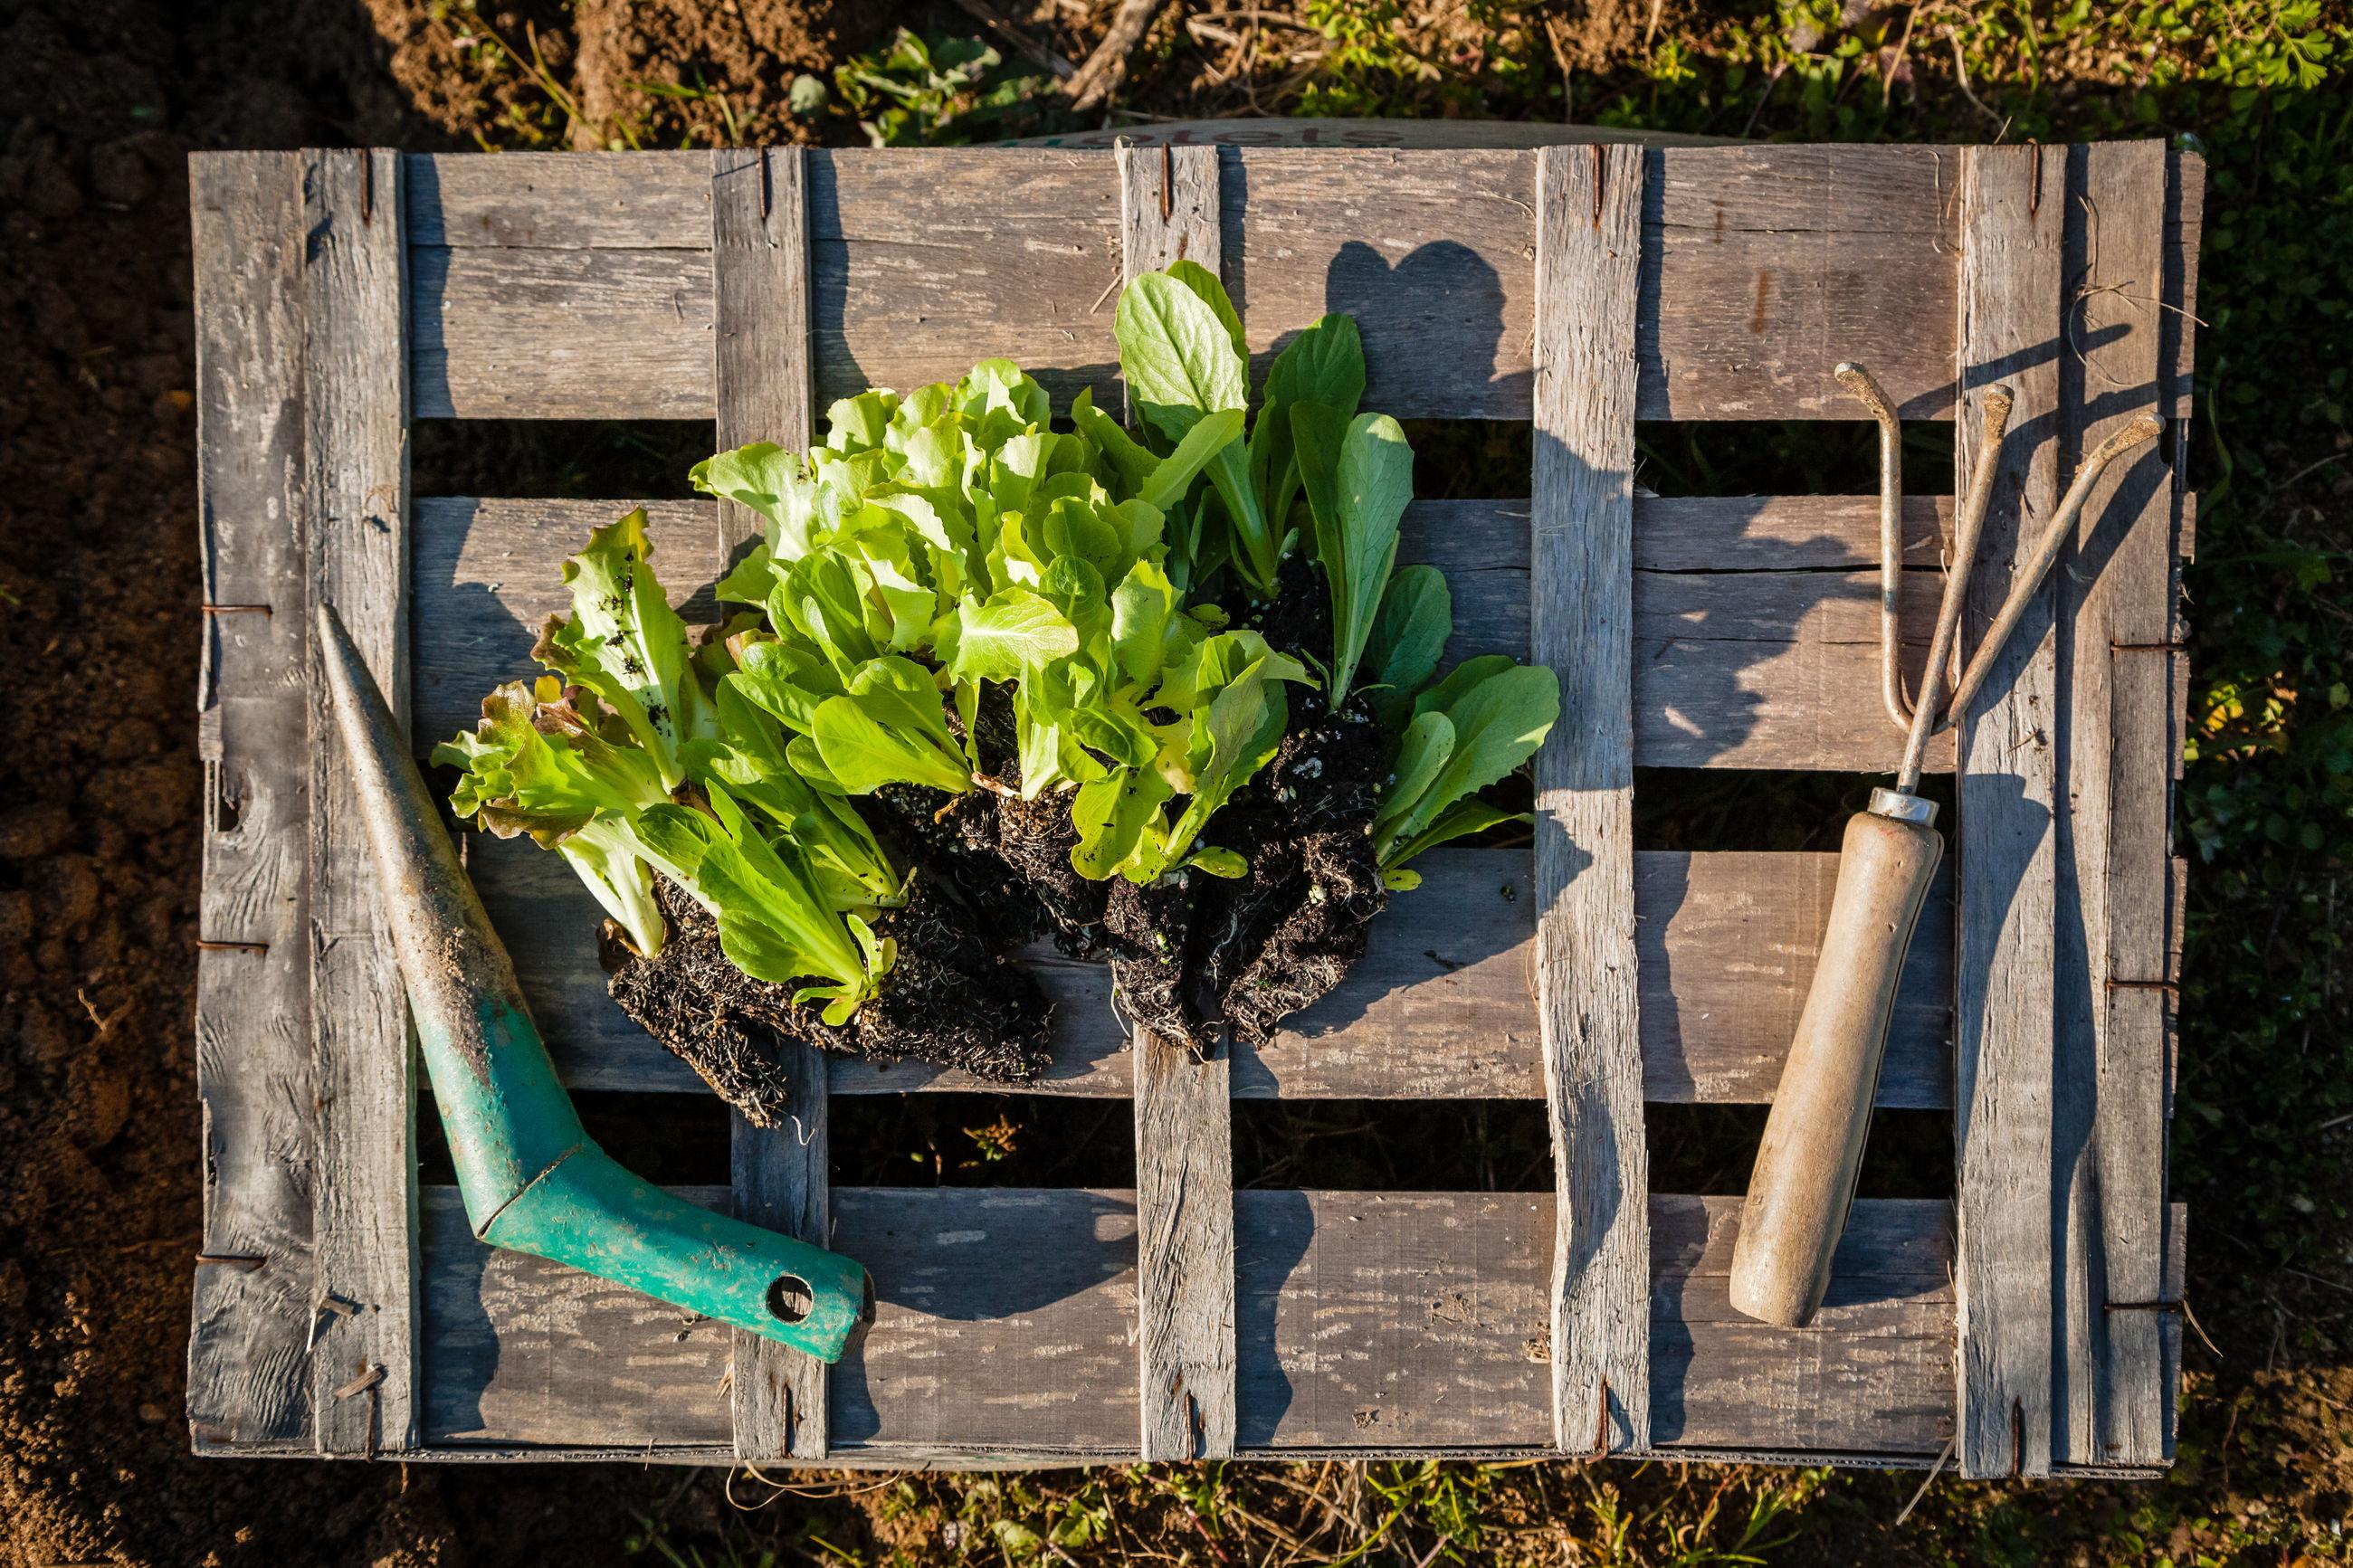 HIGH ANGLE VIEW OF FOOD ON PLANT